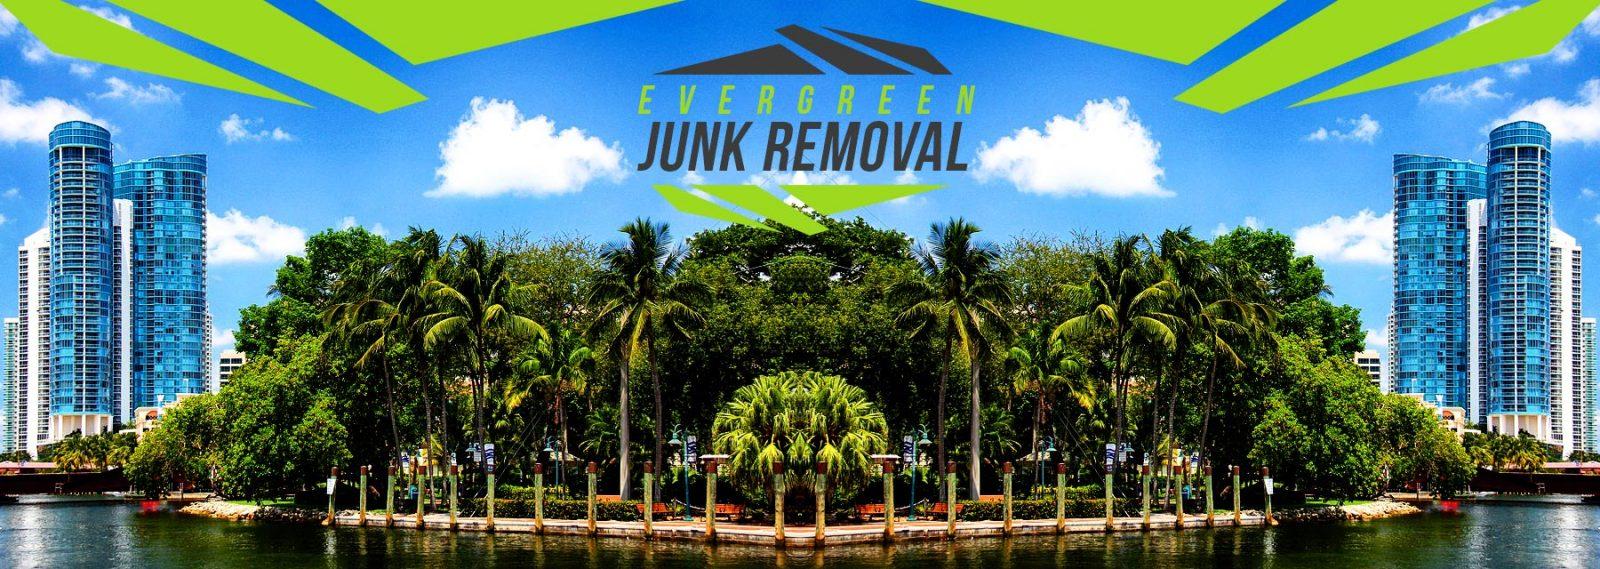 Lake Park Hot Tub Removal Company